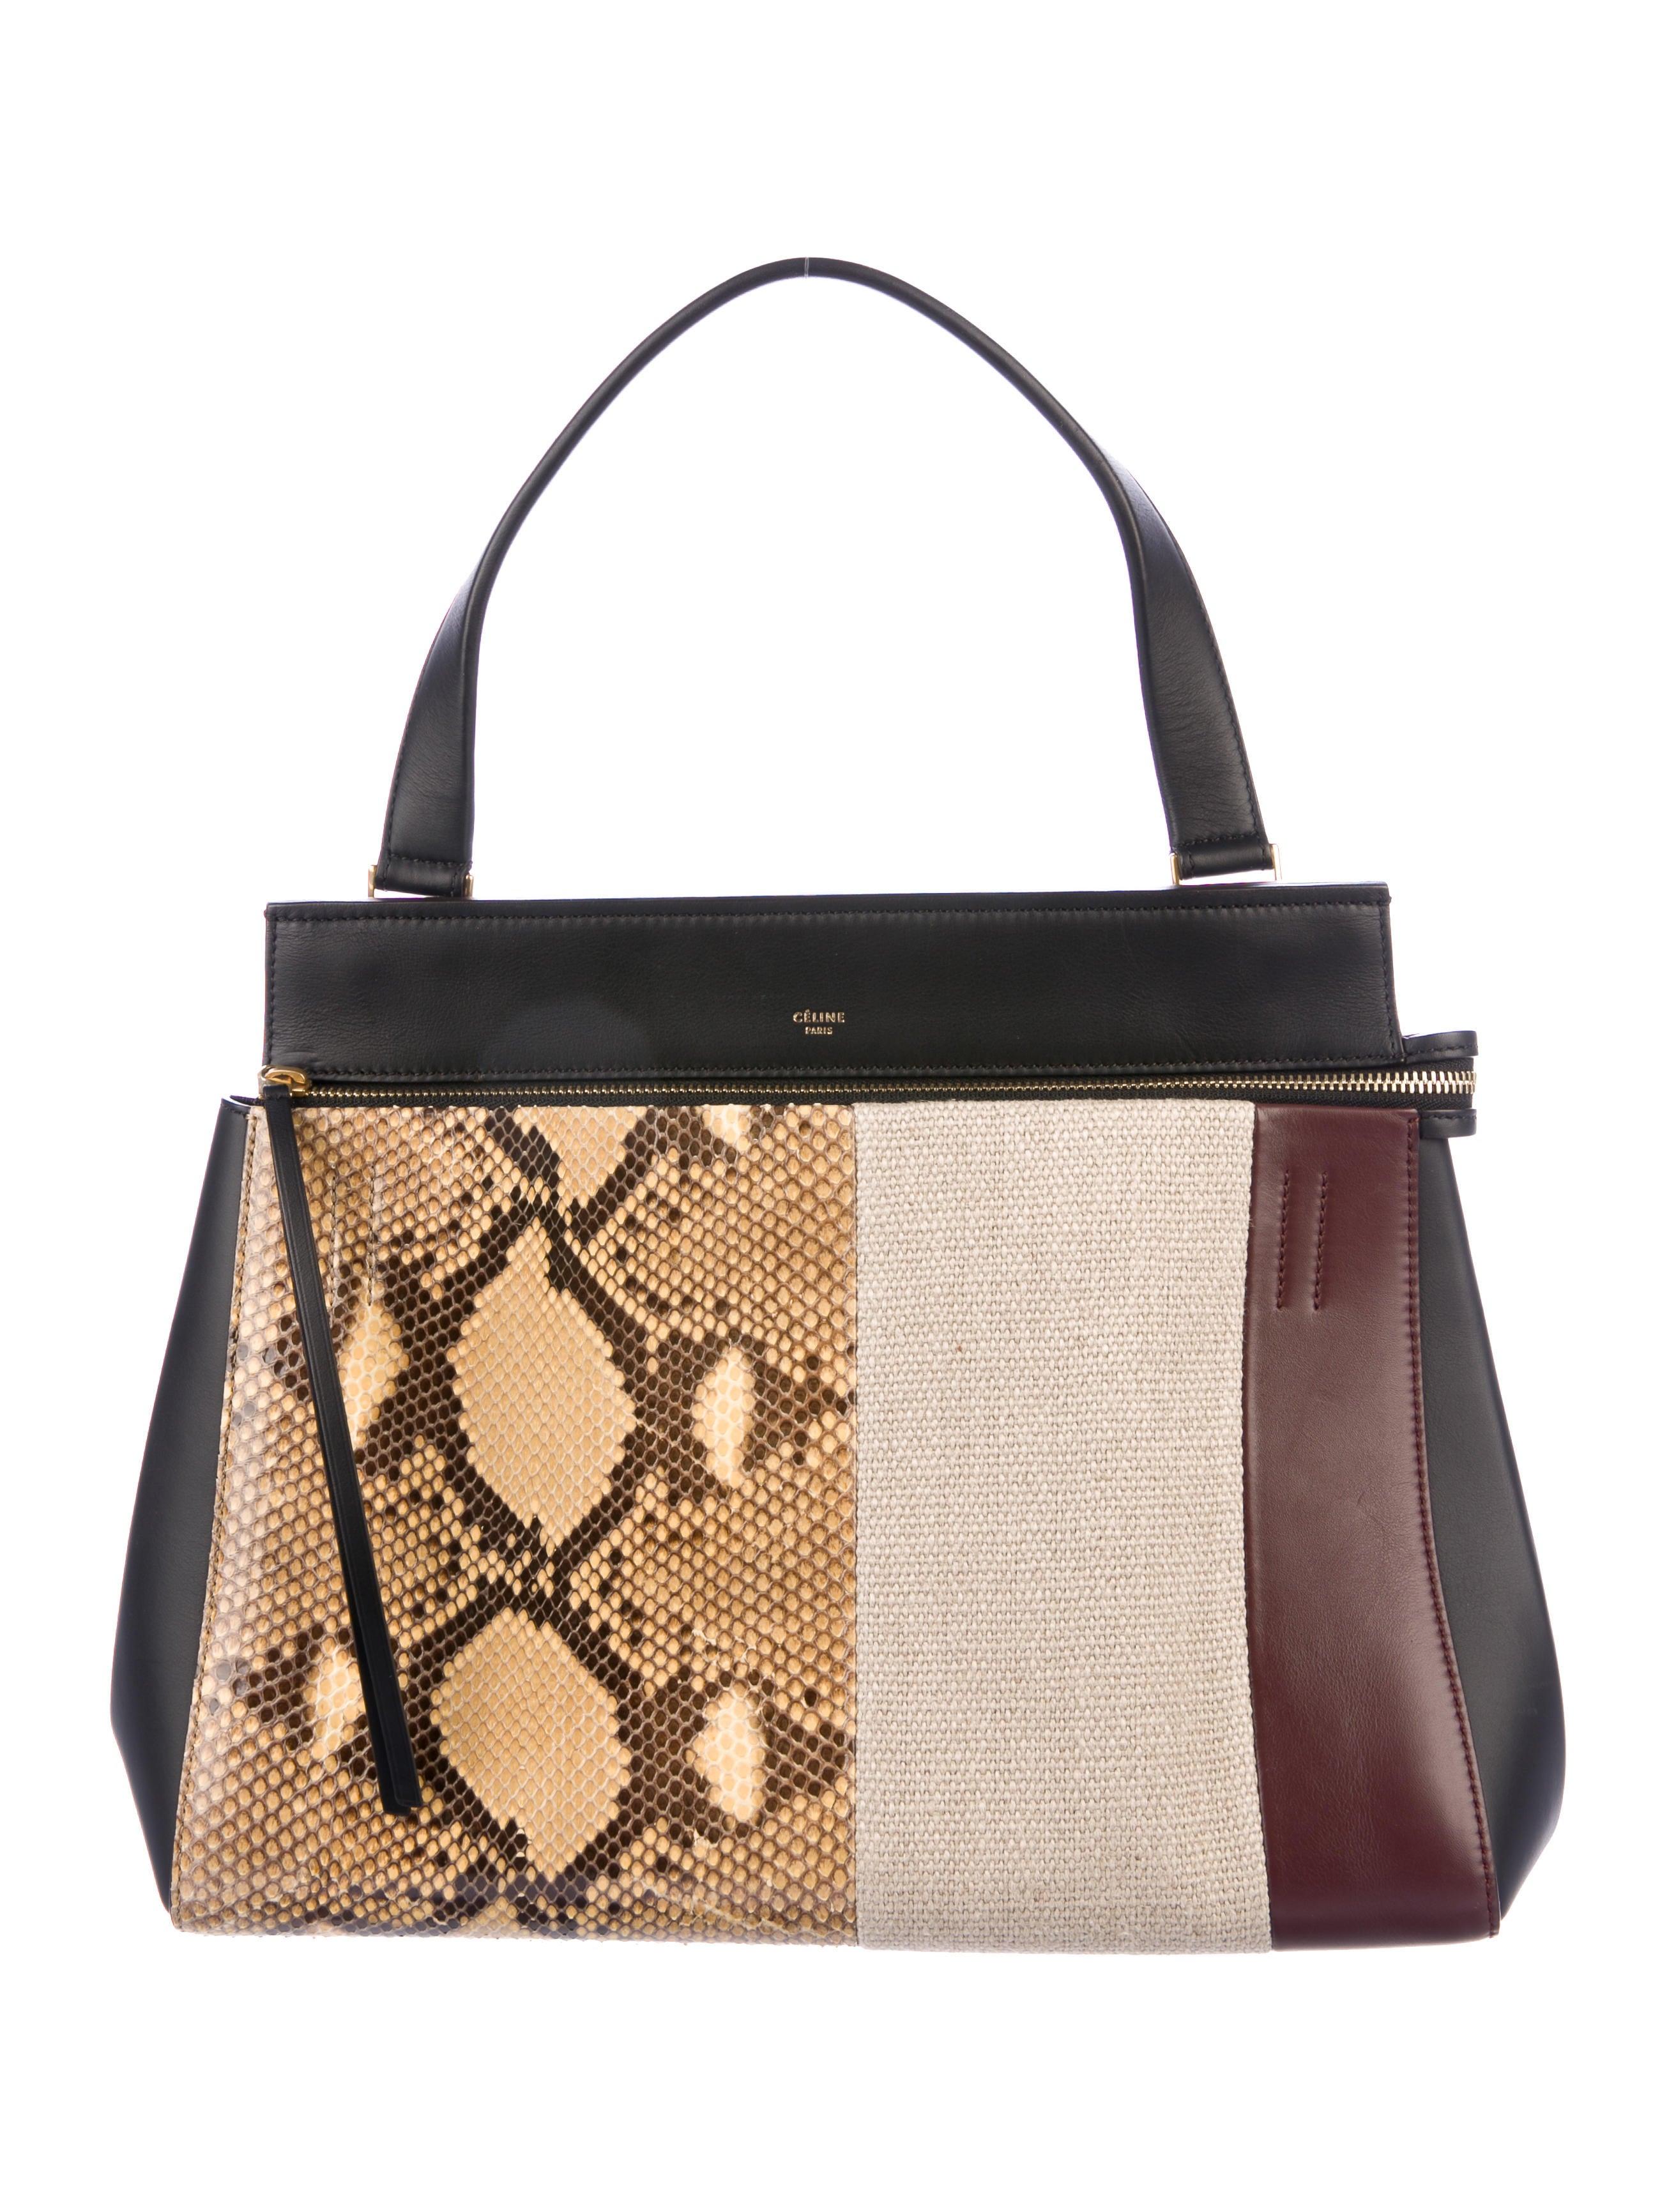 Céline Python Paneled Medium Edge Bag Handbags Cel63062 The Realreal